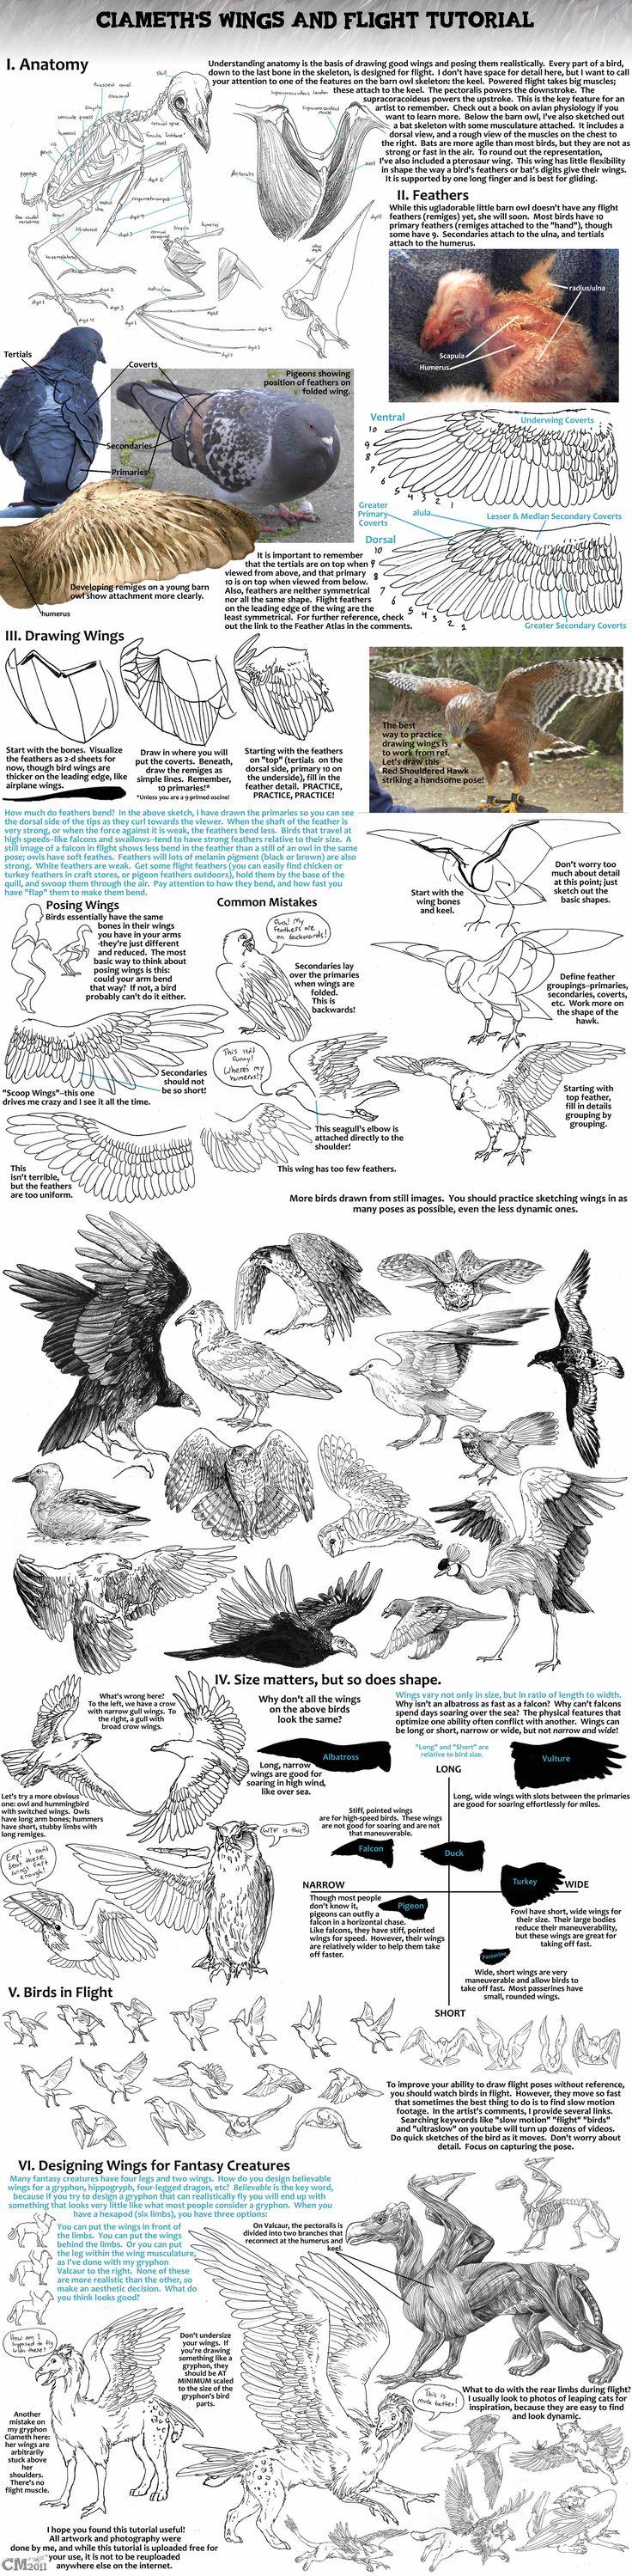 Animals Used in Education | PETA